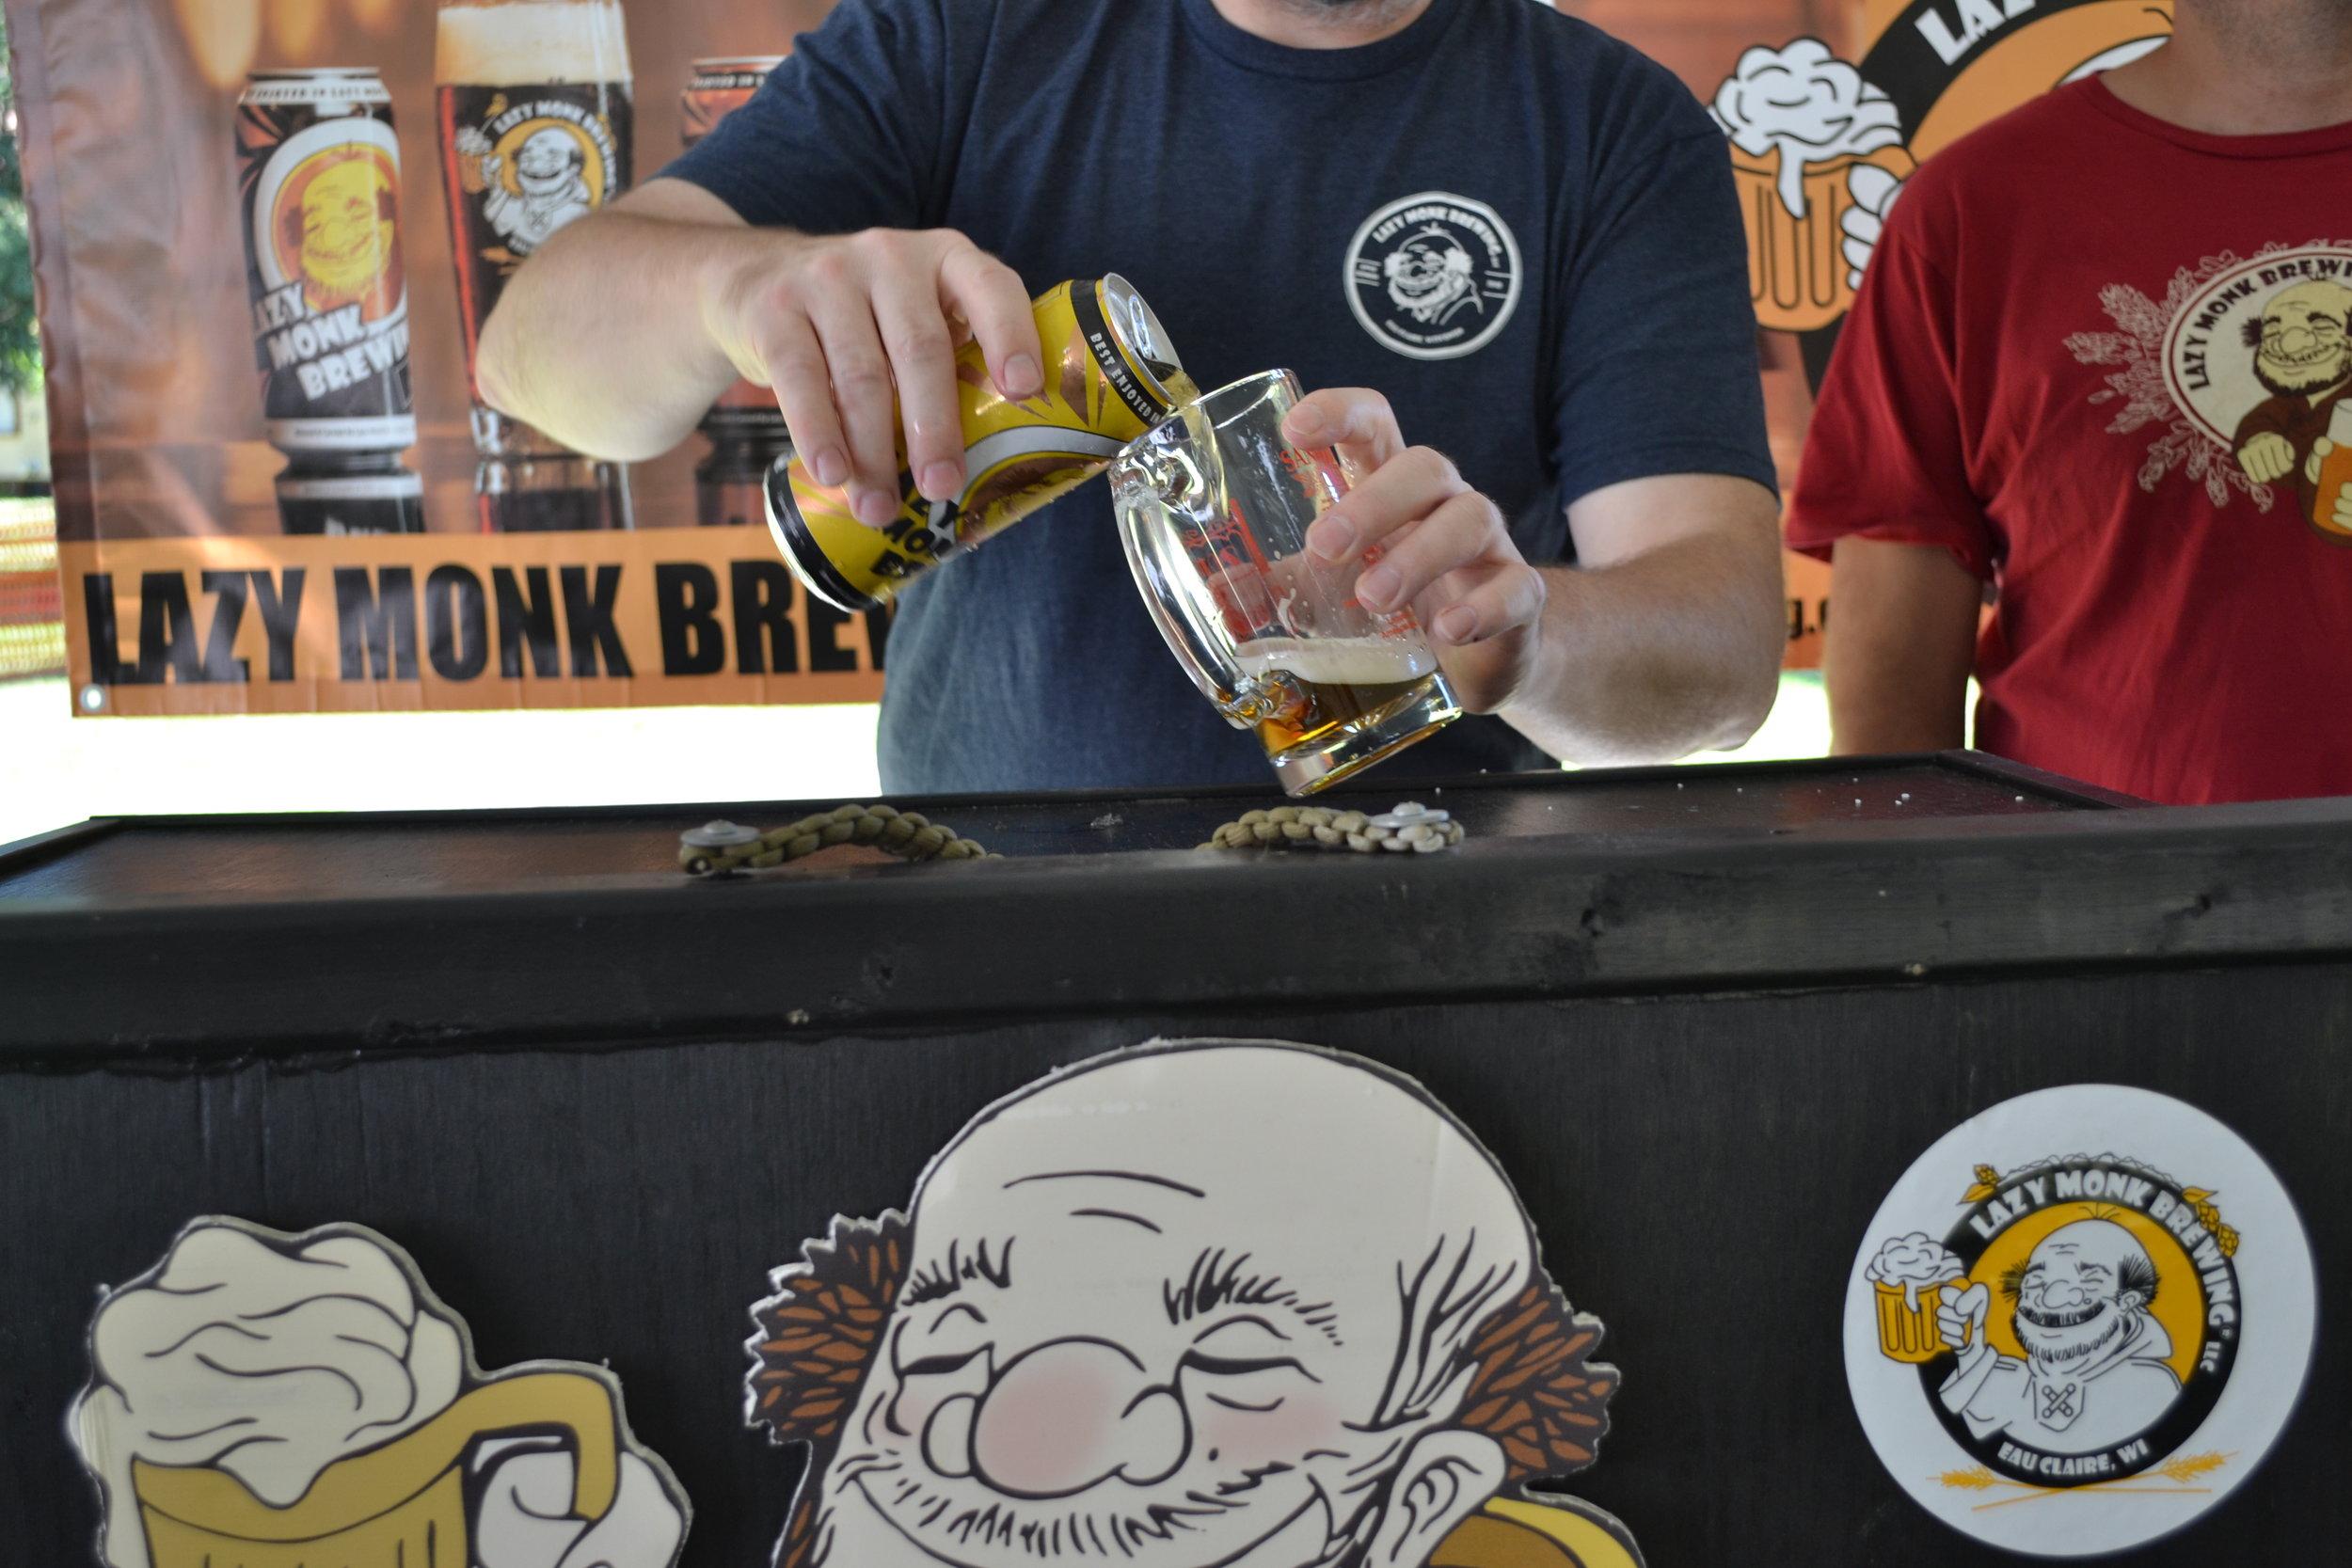 Lazy Monk brewfest 2016.JPG